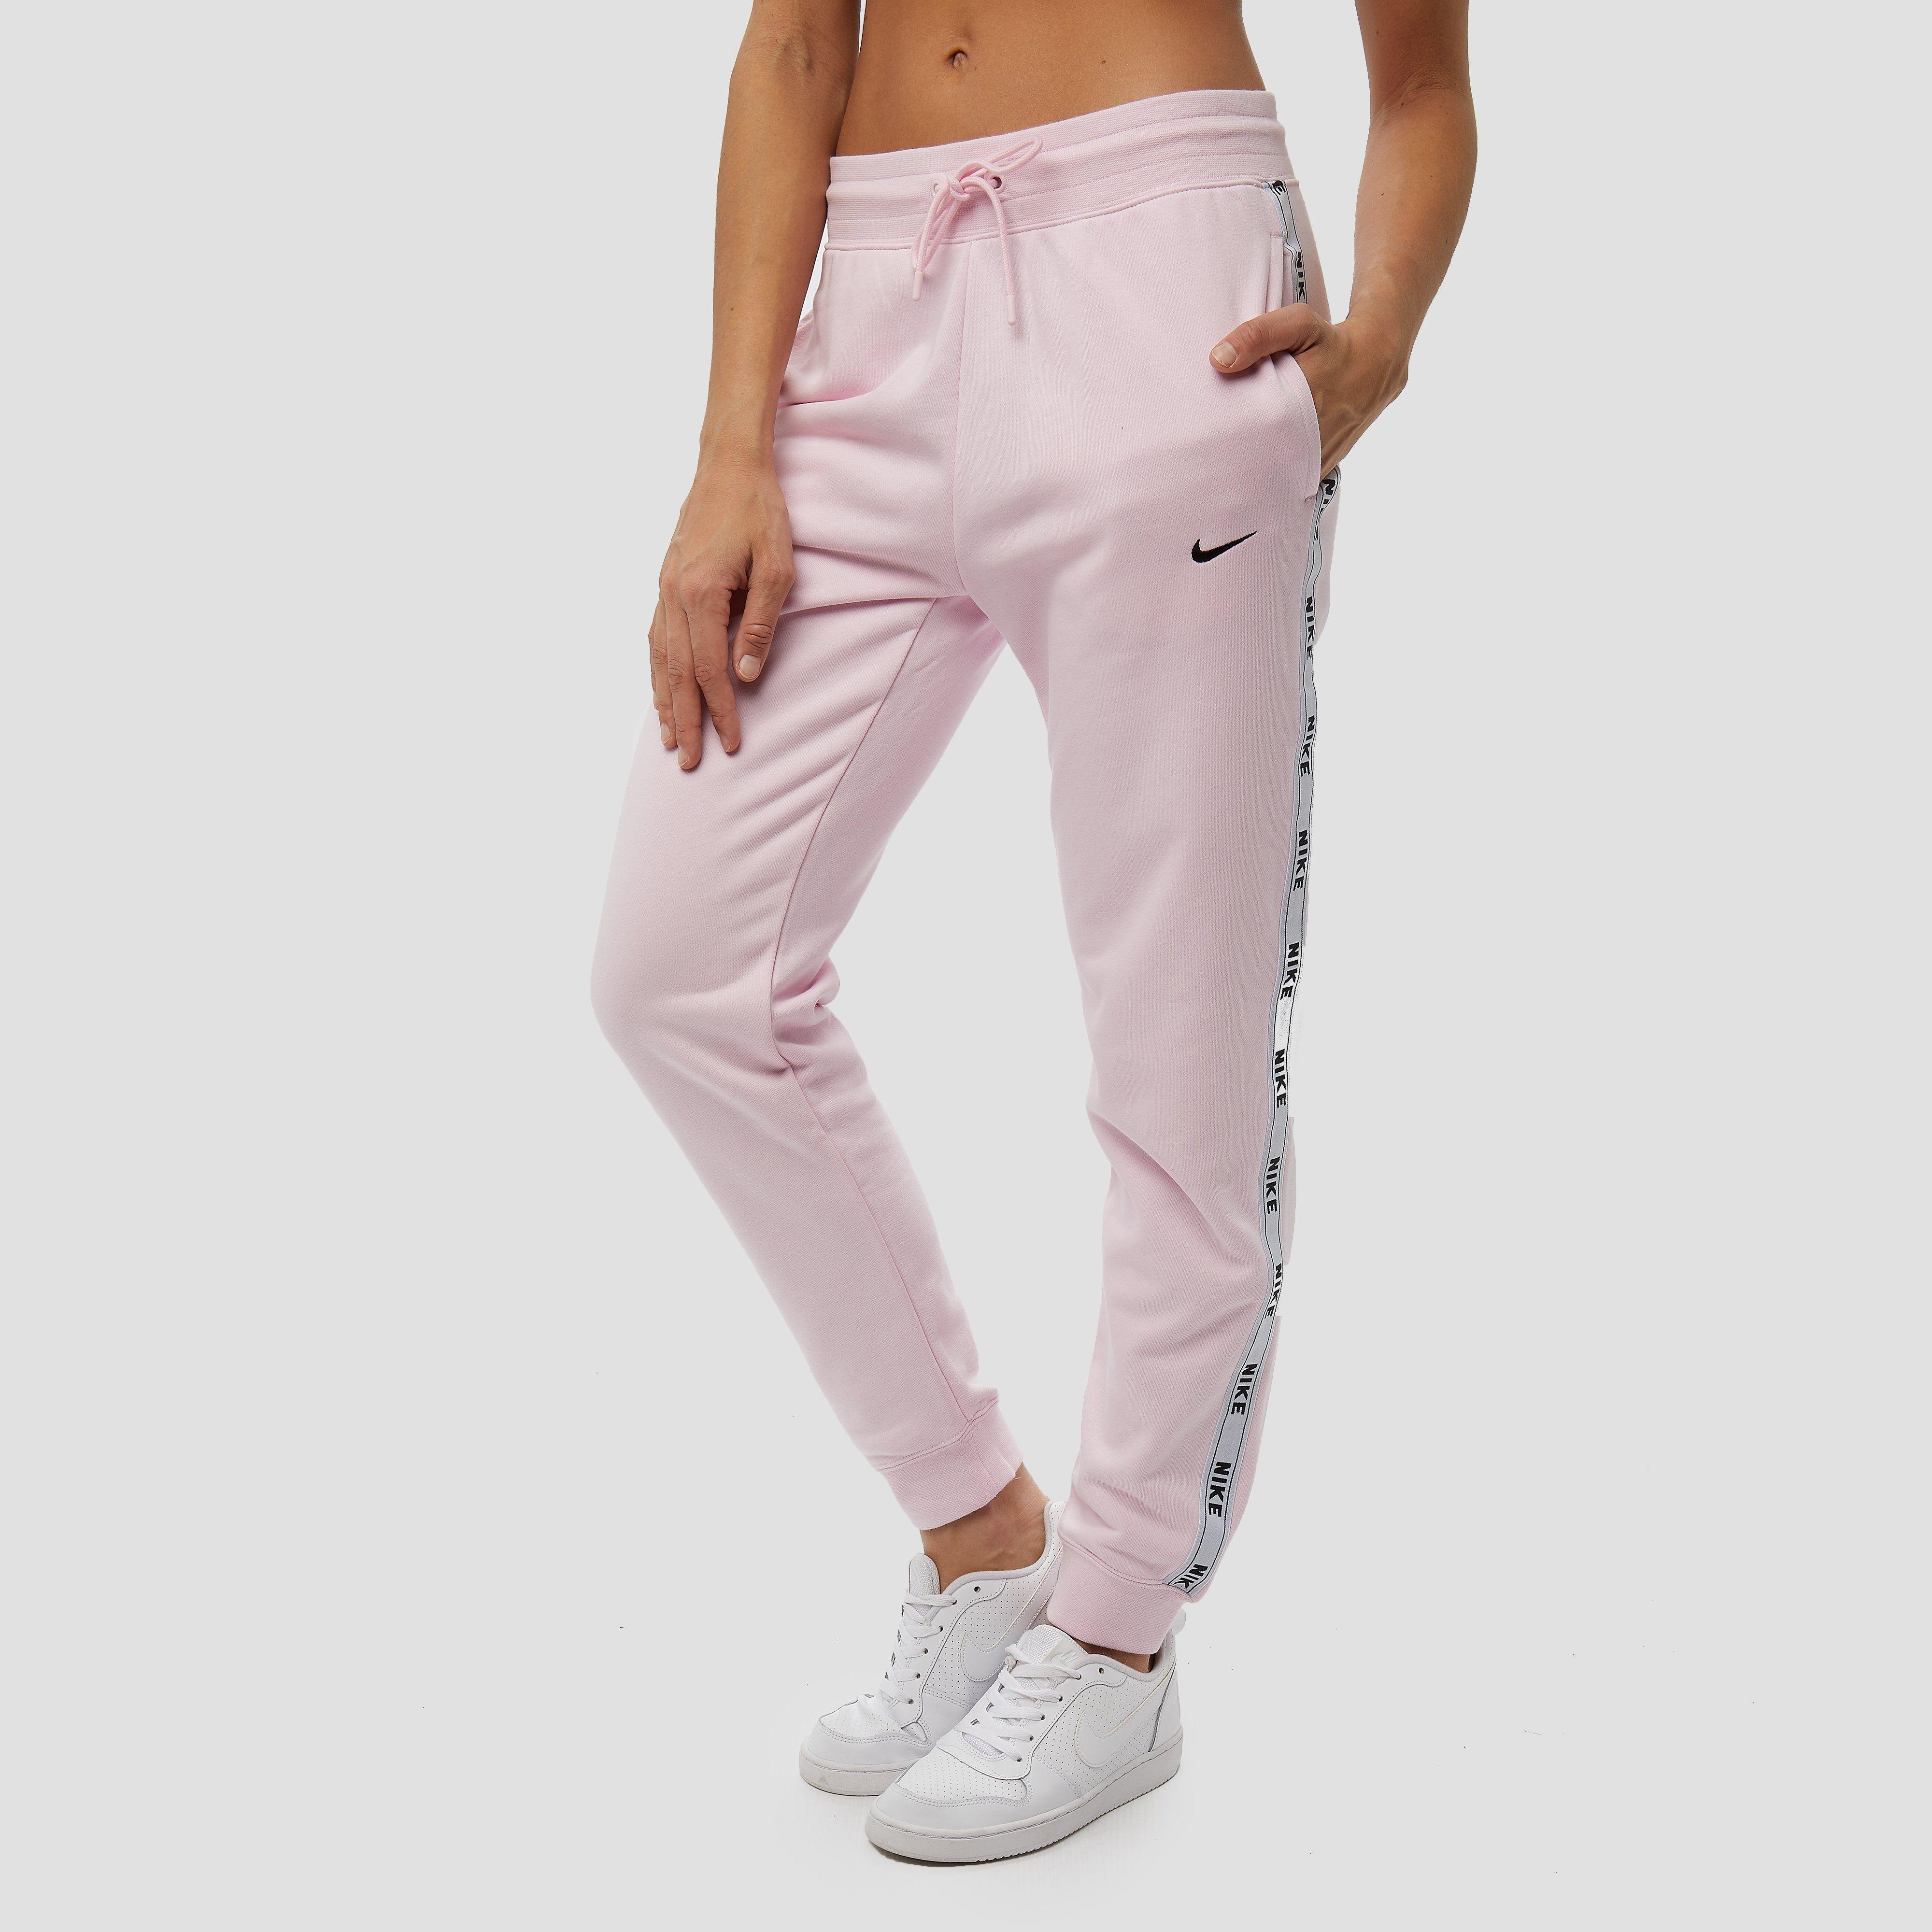 Pin by Bellevputten on Kleding | Clothes, Fashion, Sweatpants